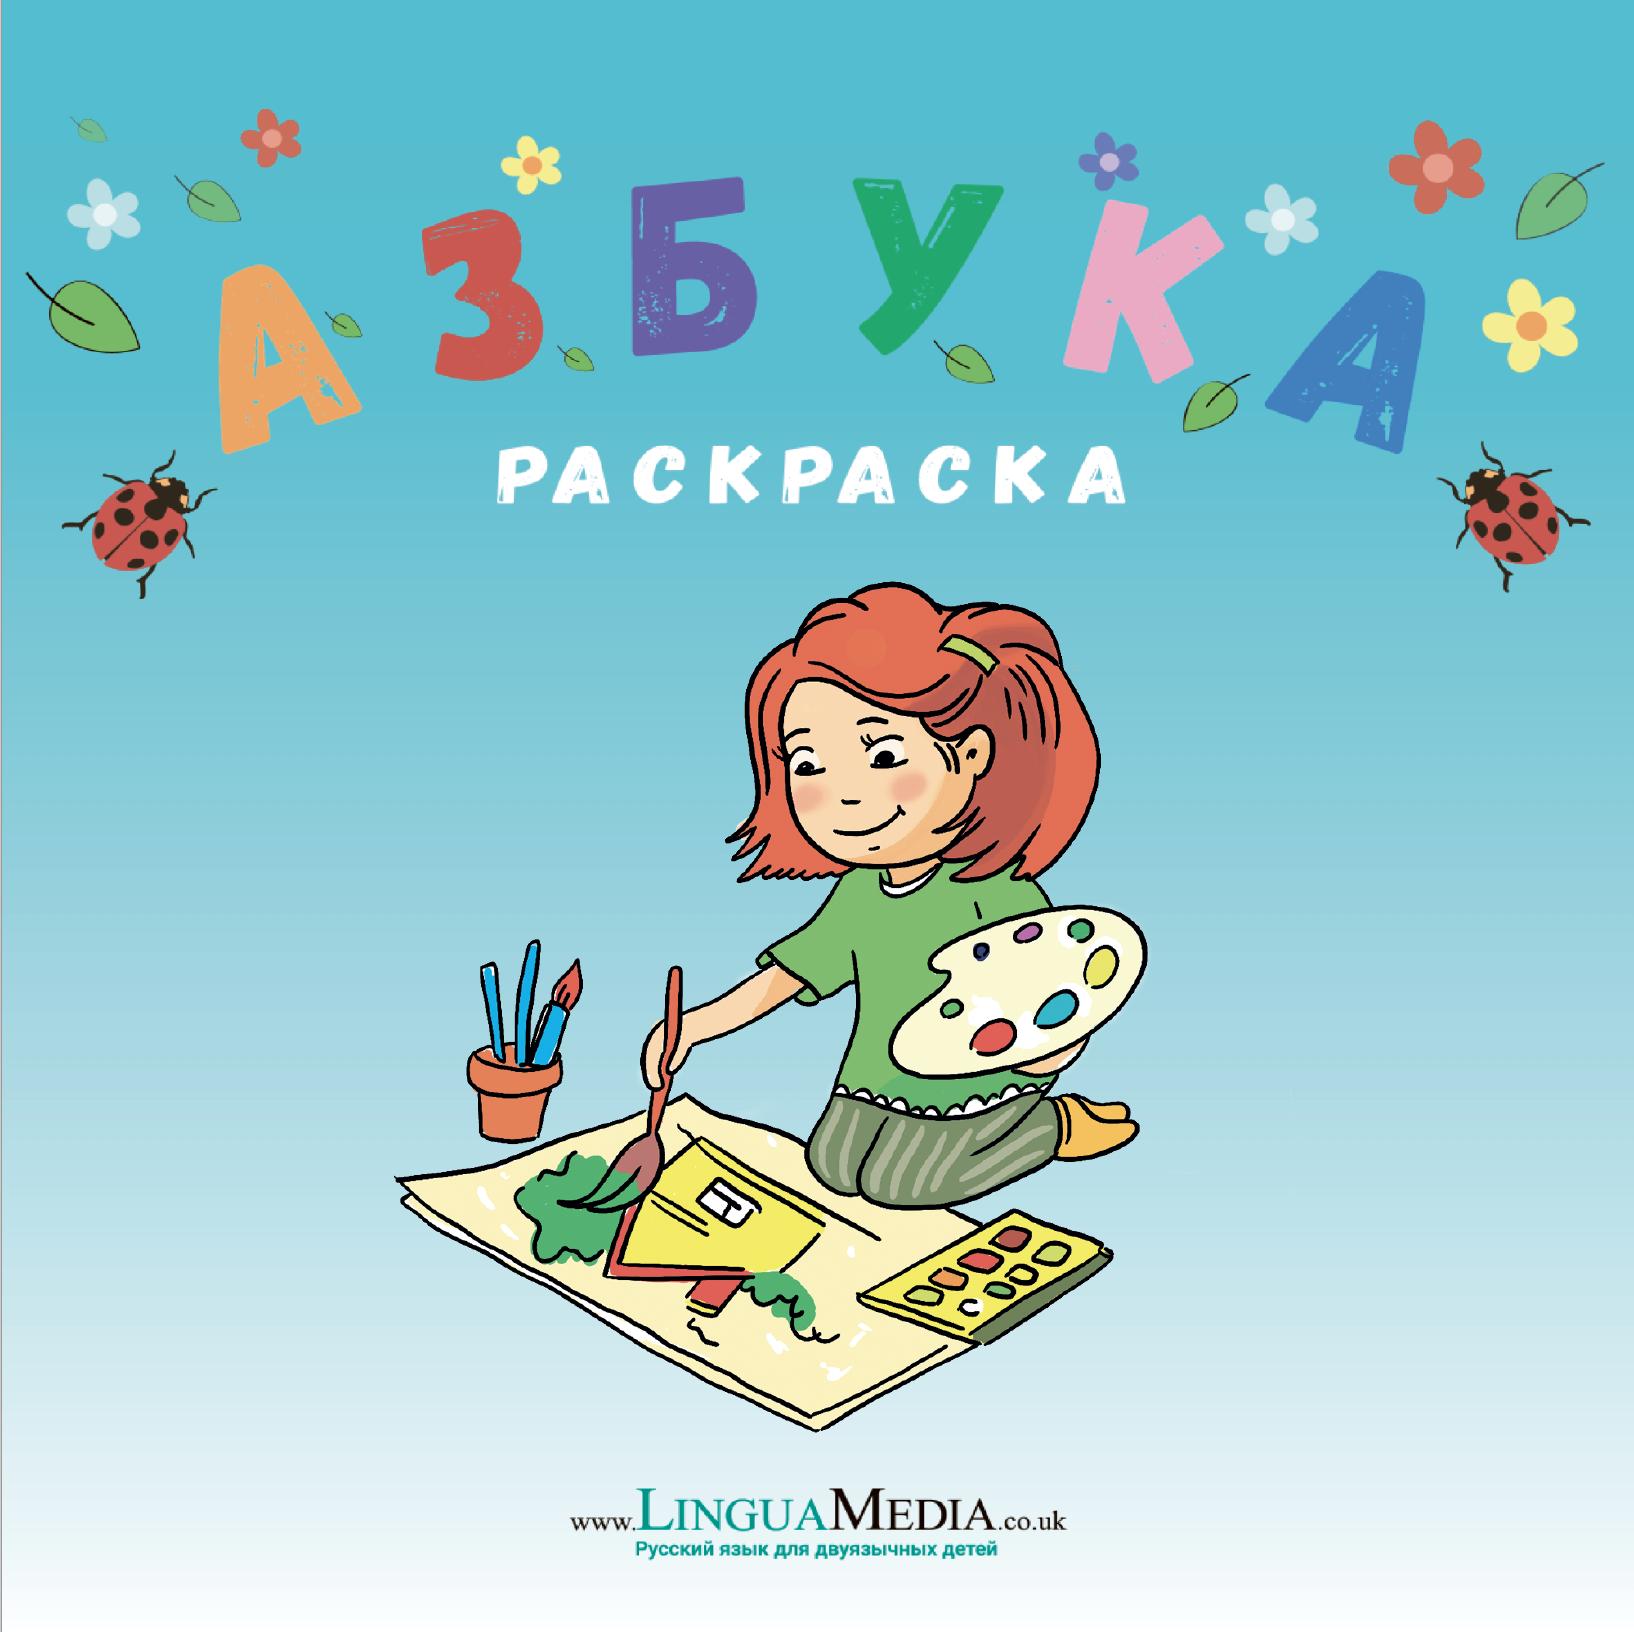 https://www.linguamedia.co.uk/product/raskraska-azbuka-na-pruzhinke/#iLightbox[product-gallery]/0